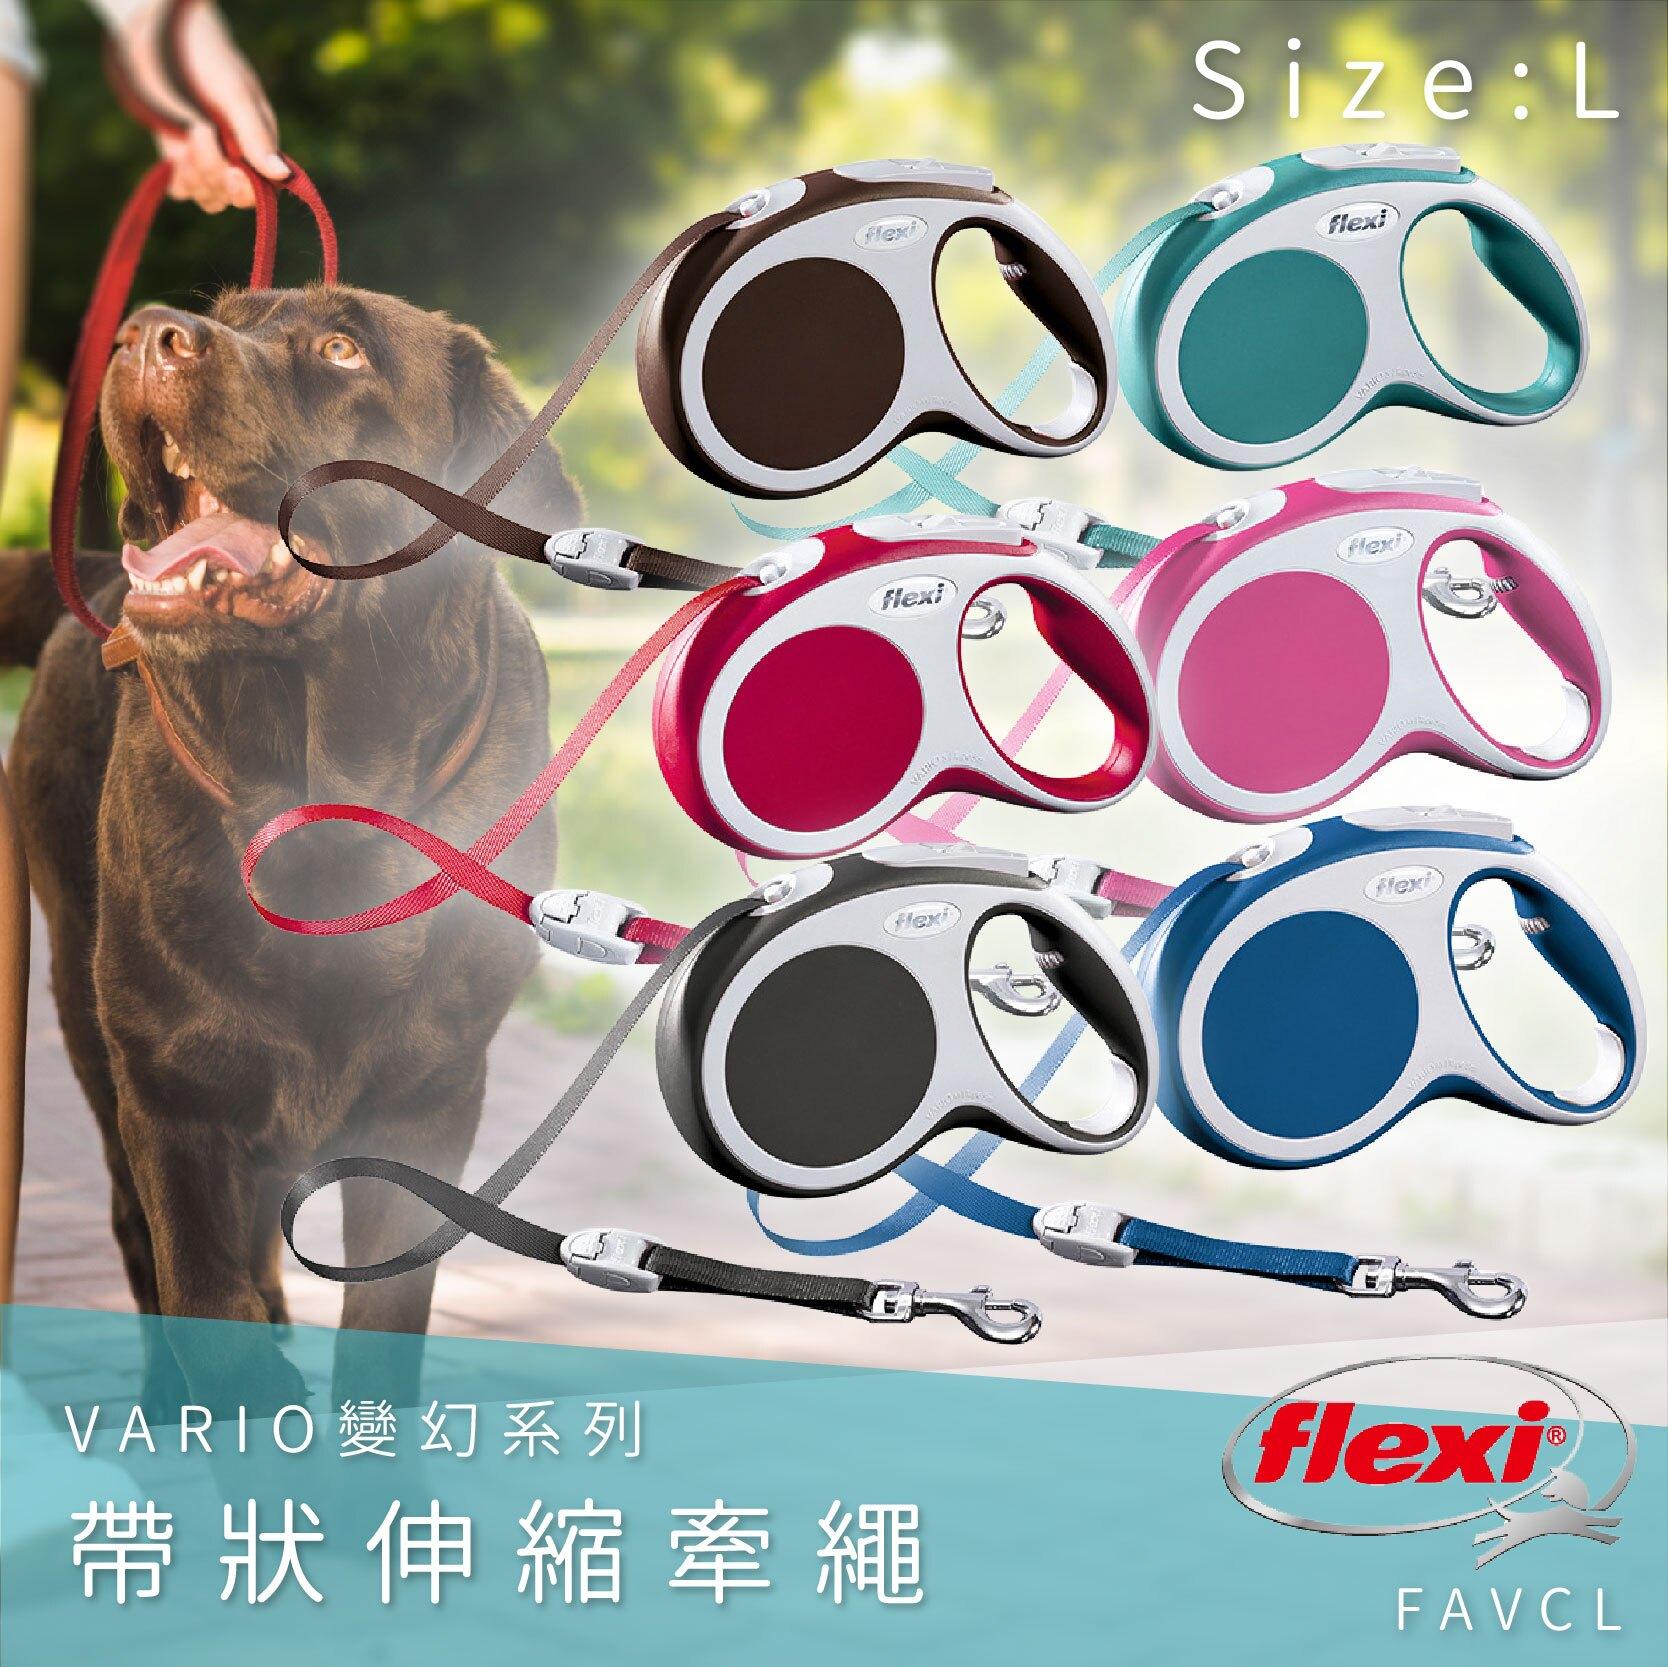 Flexi飛萊希 帶狀伸縮牽繩 L FAVCL 變幻系列 舒適握把 狗貓 外出用品 寵物用品 寵物牽繩 德國製 六色